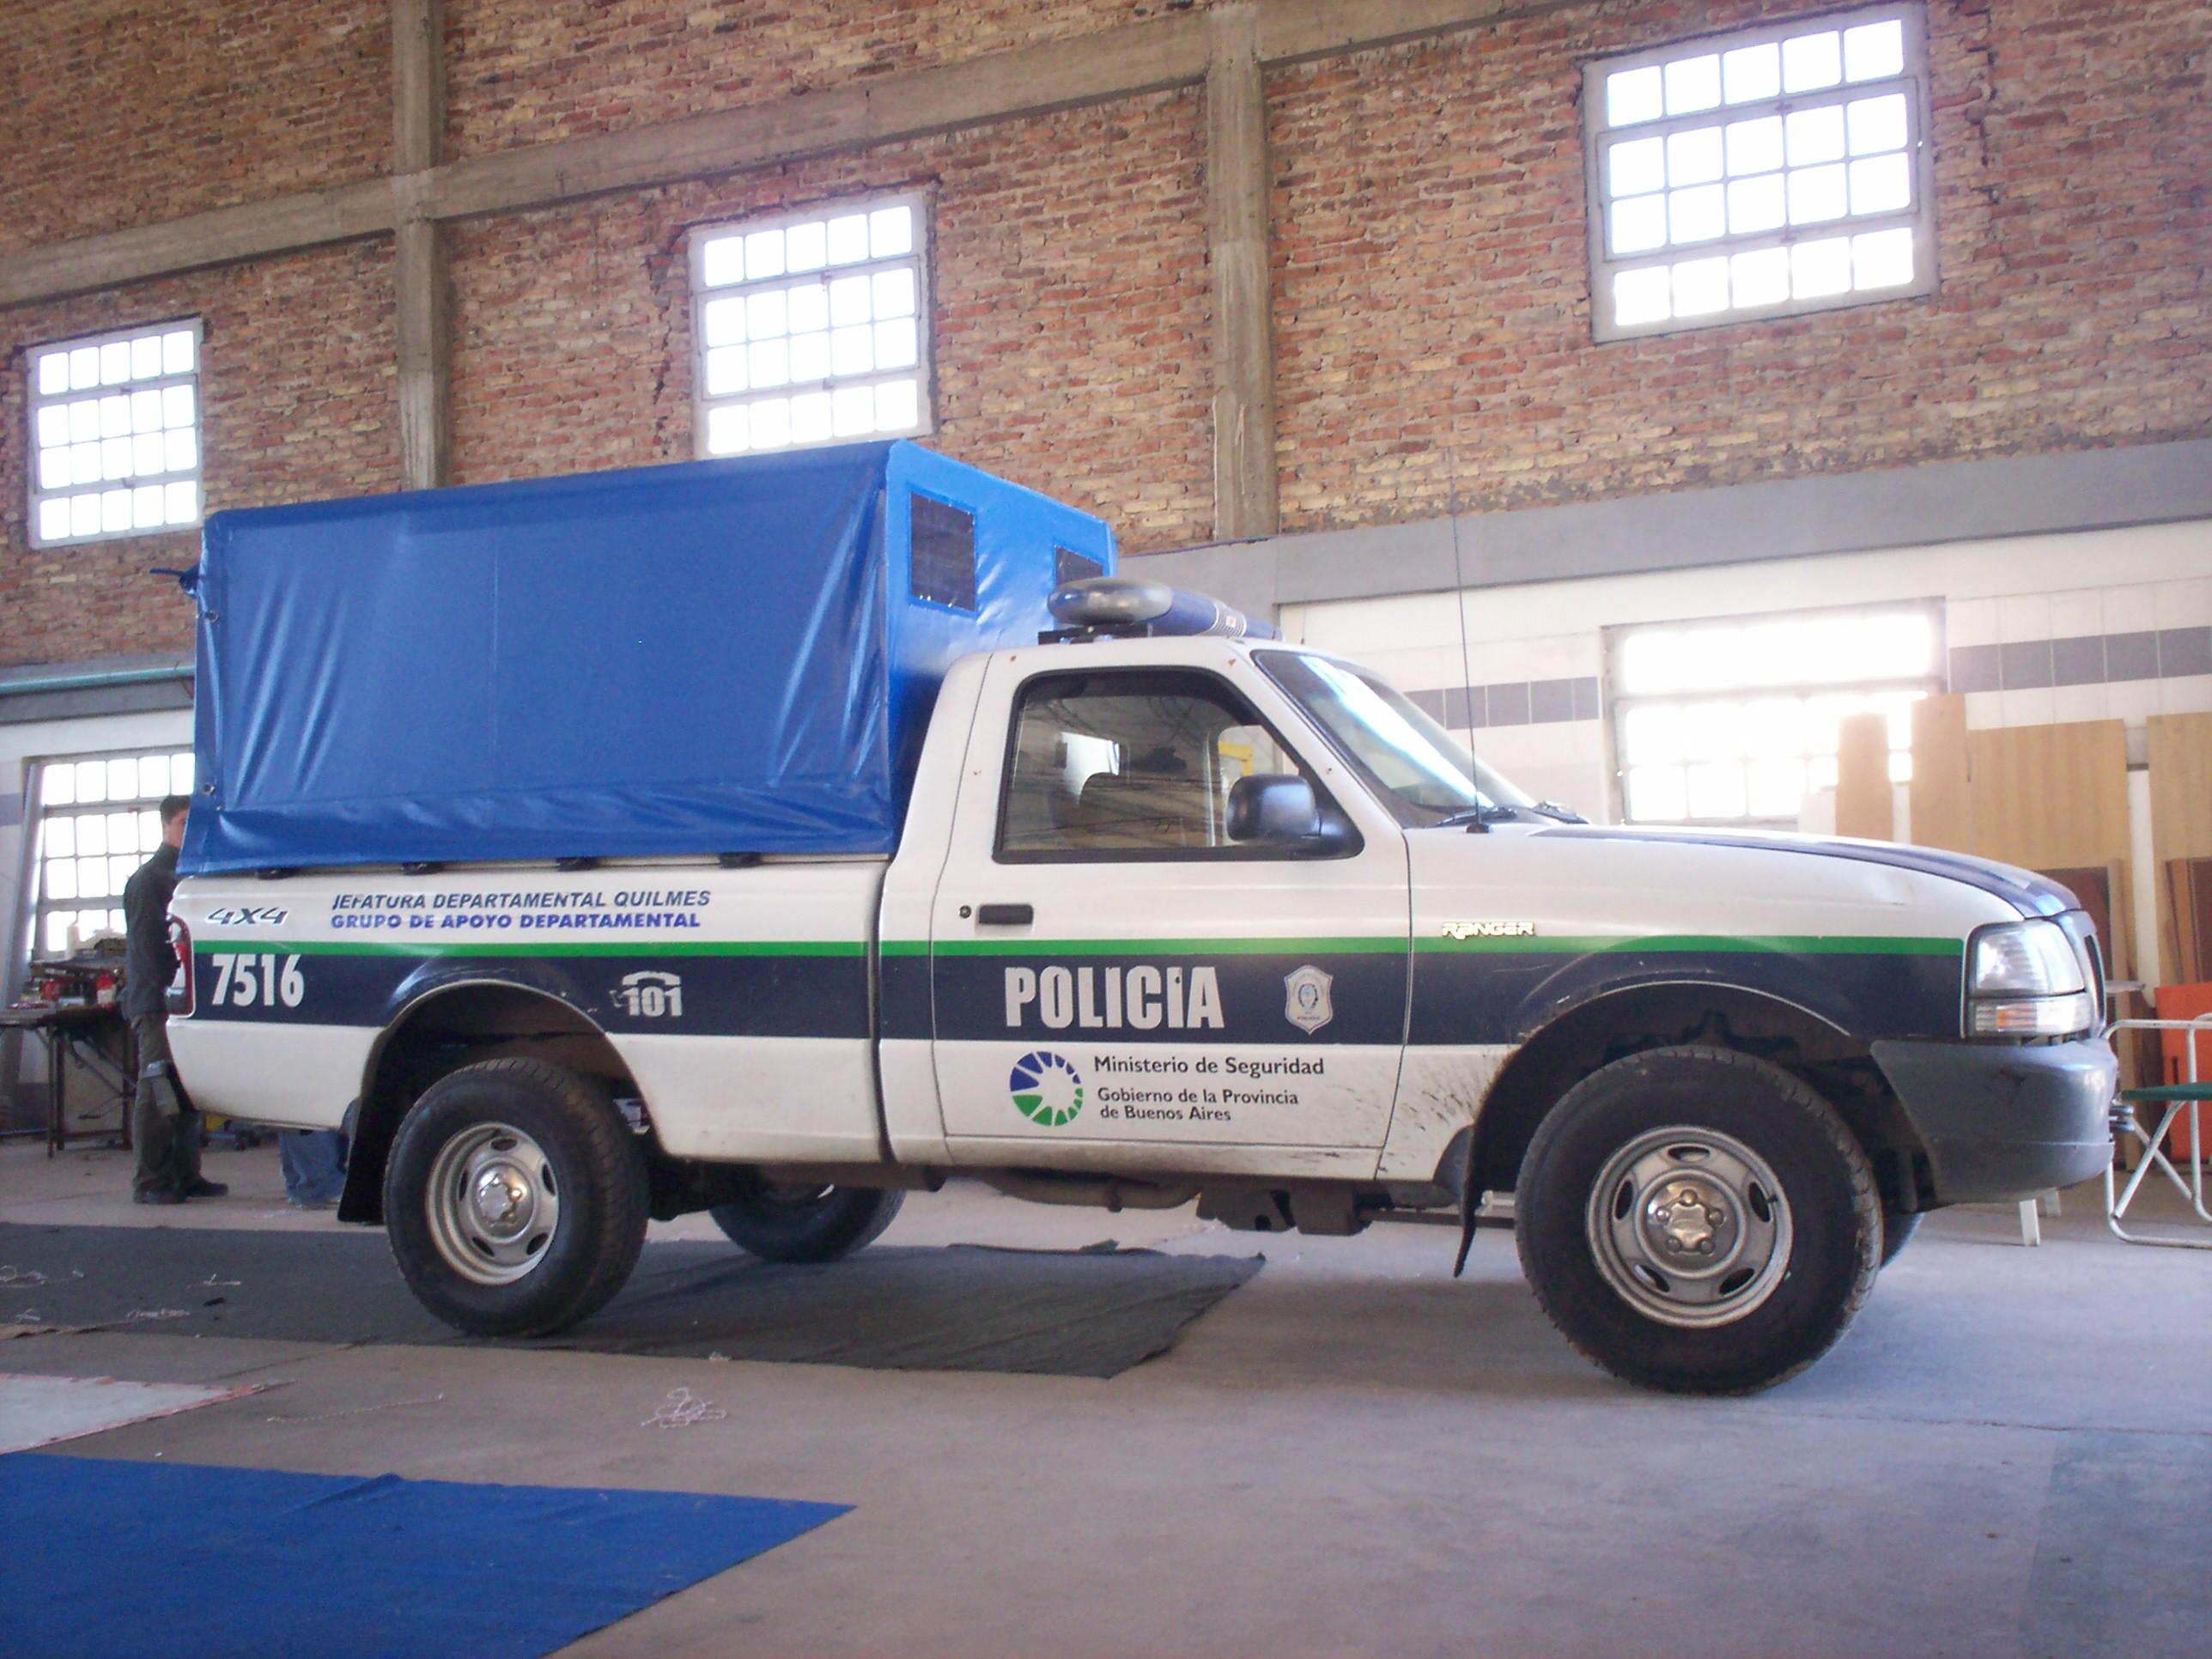 POLICIA DE QUILMES